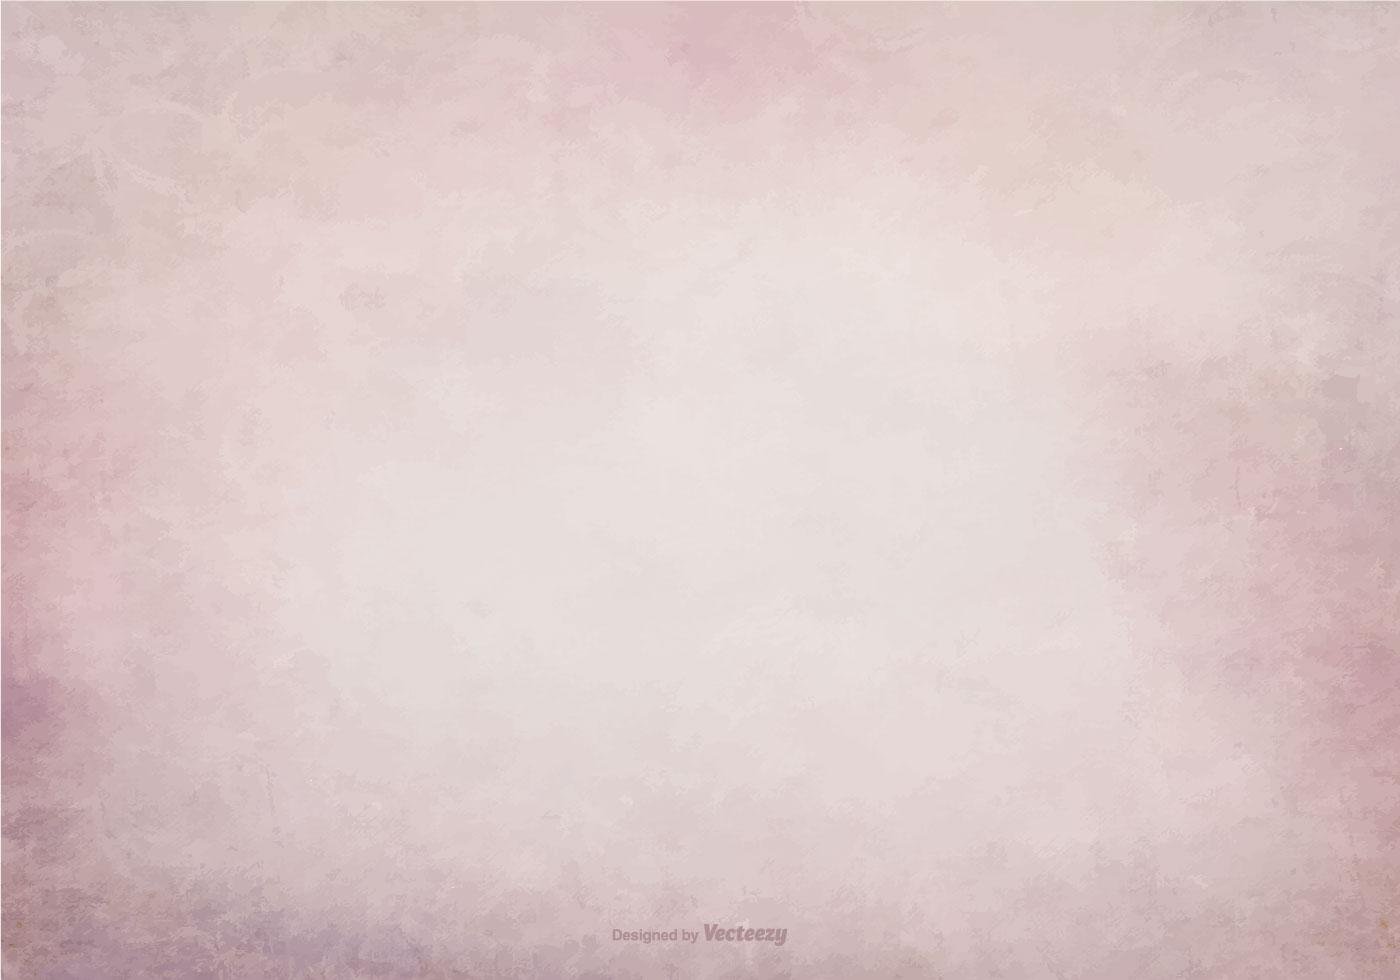 pink vintage grunge background download free vector art stock